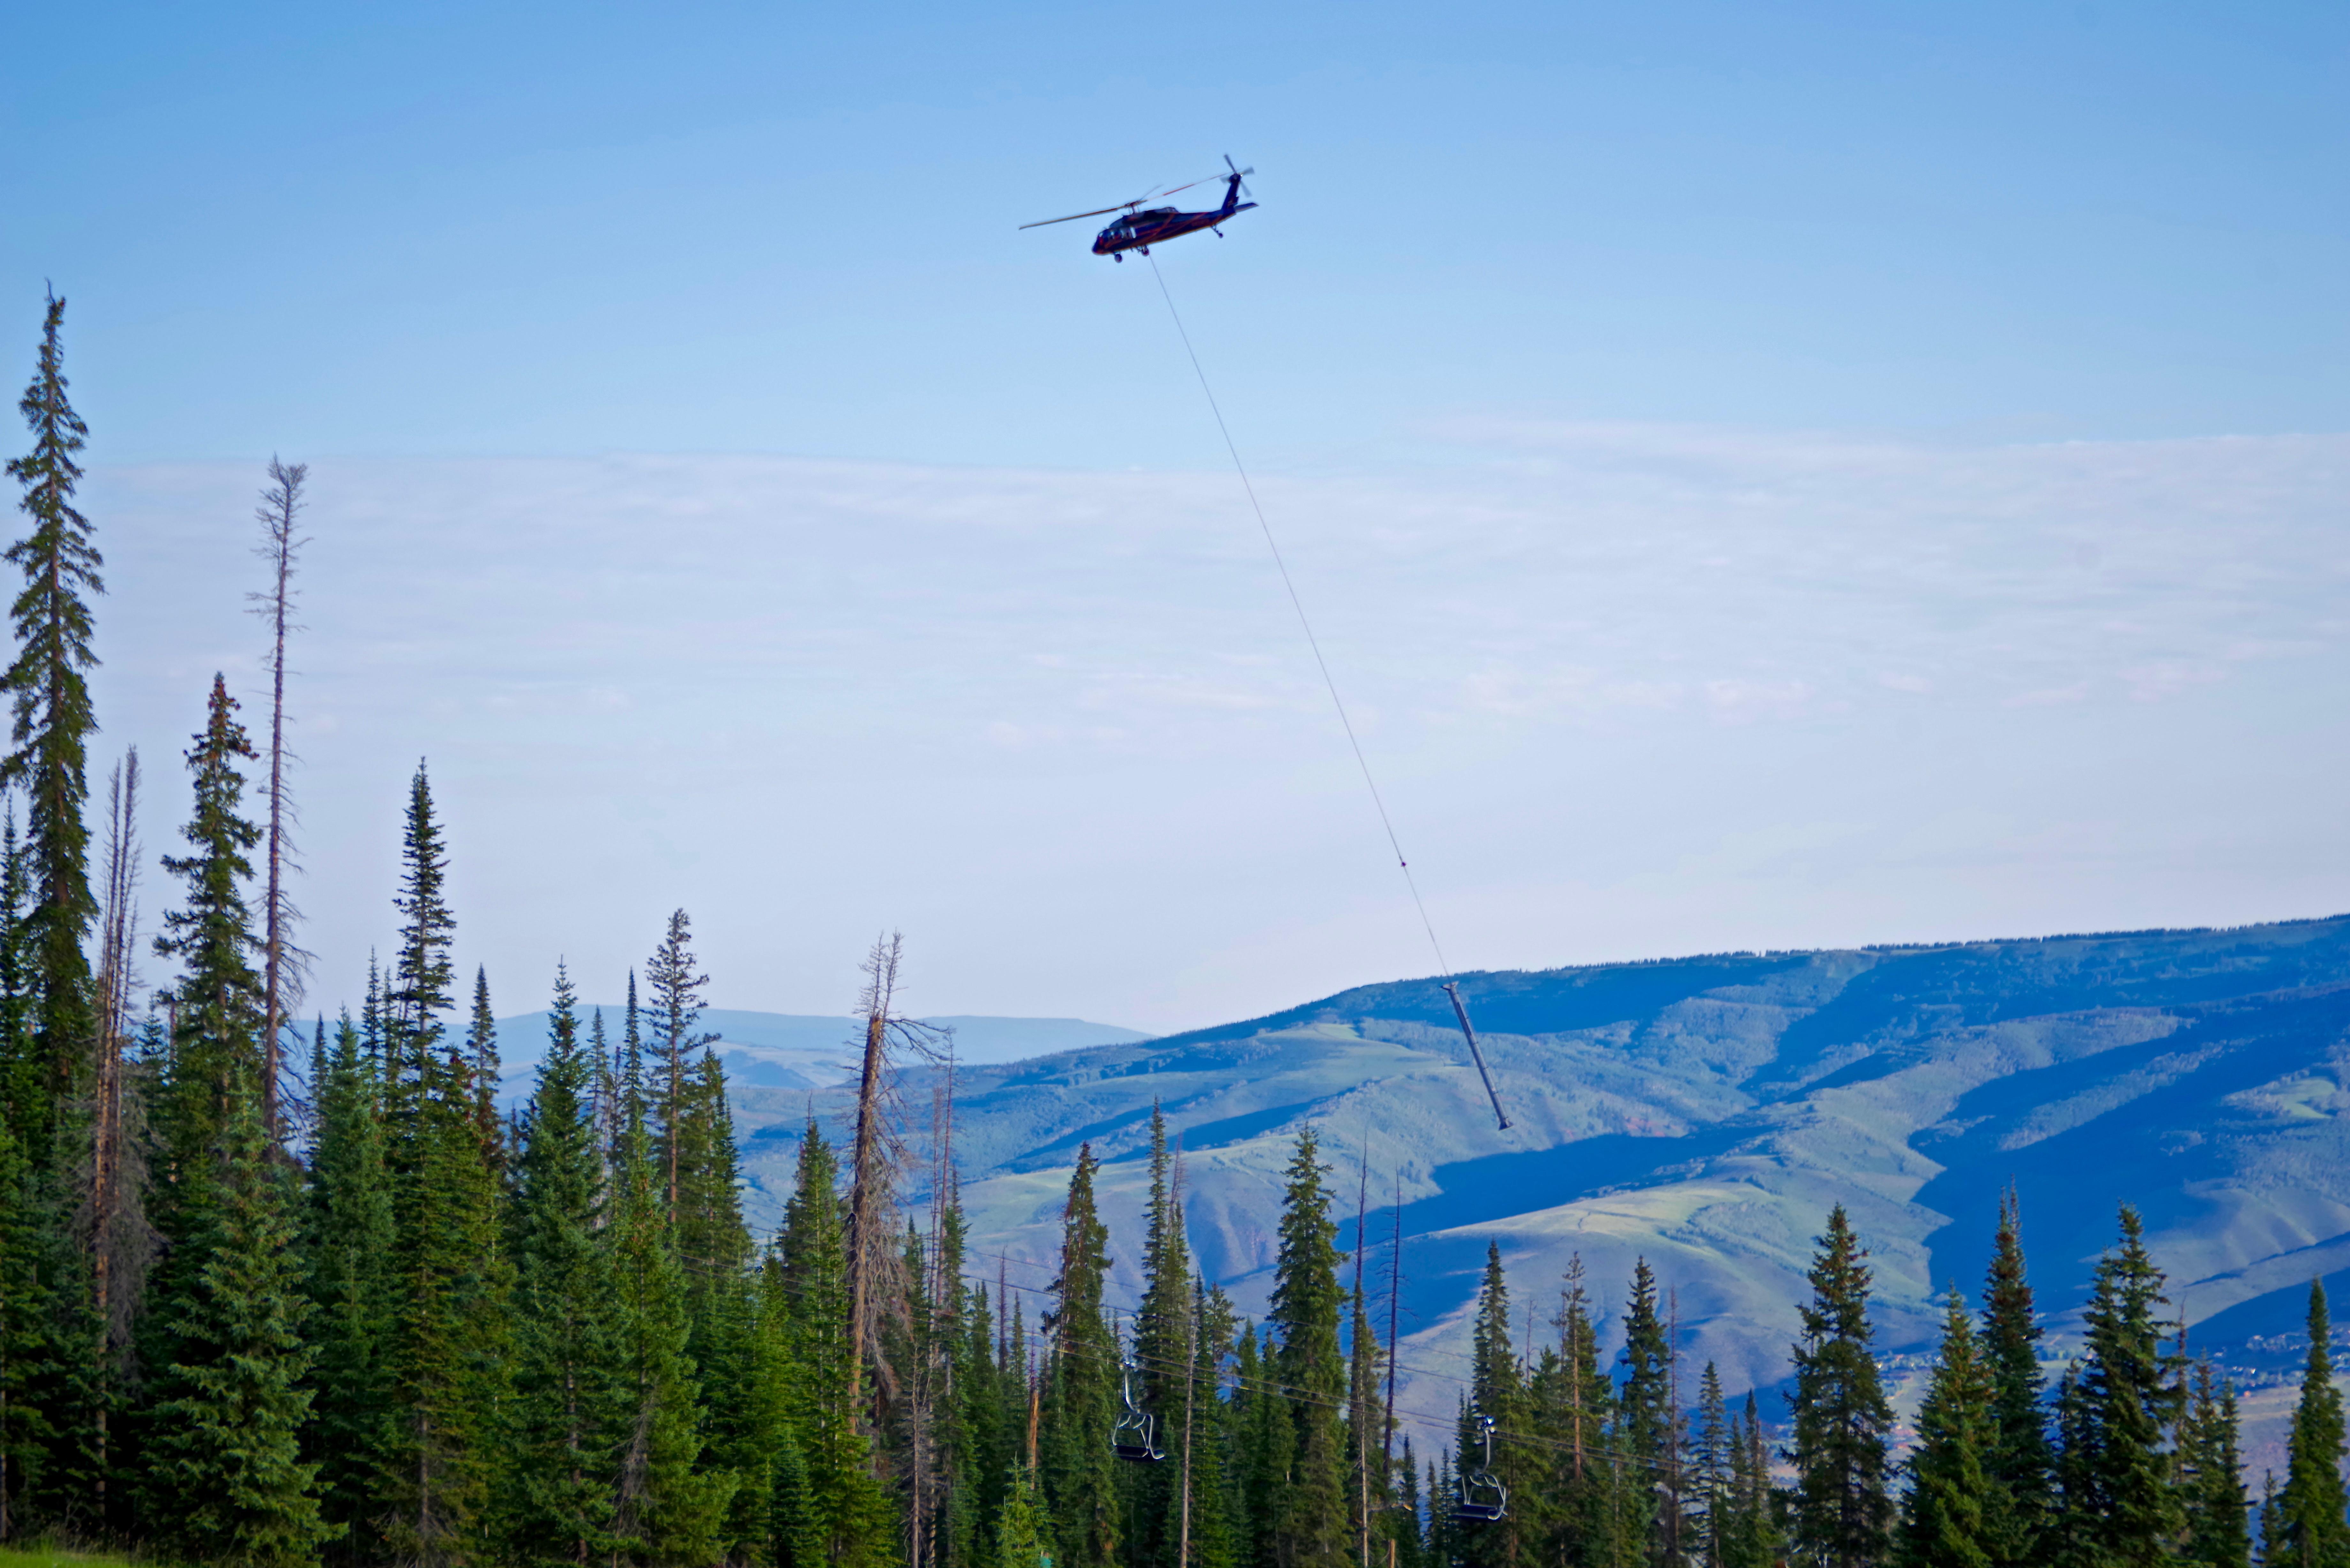 20170713_Beaver Creek Red Buffalo Express_Sunrise_74_Lift Tower_Helicopter_JonResnick.jpg